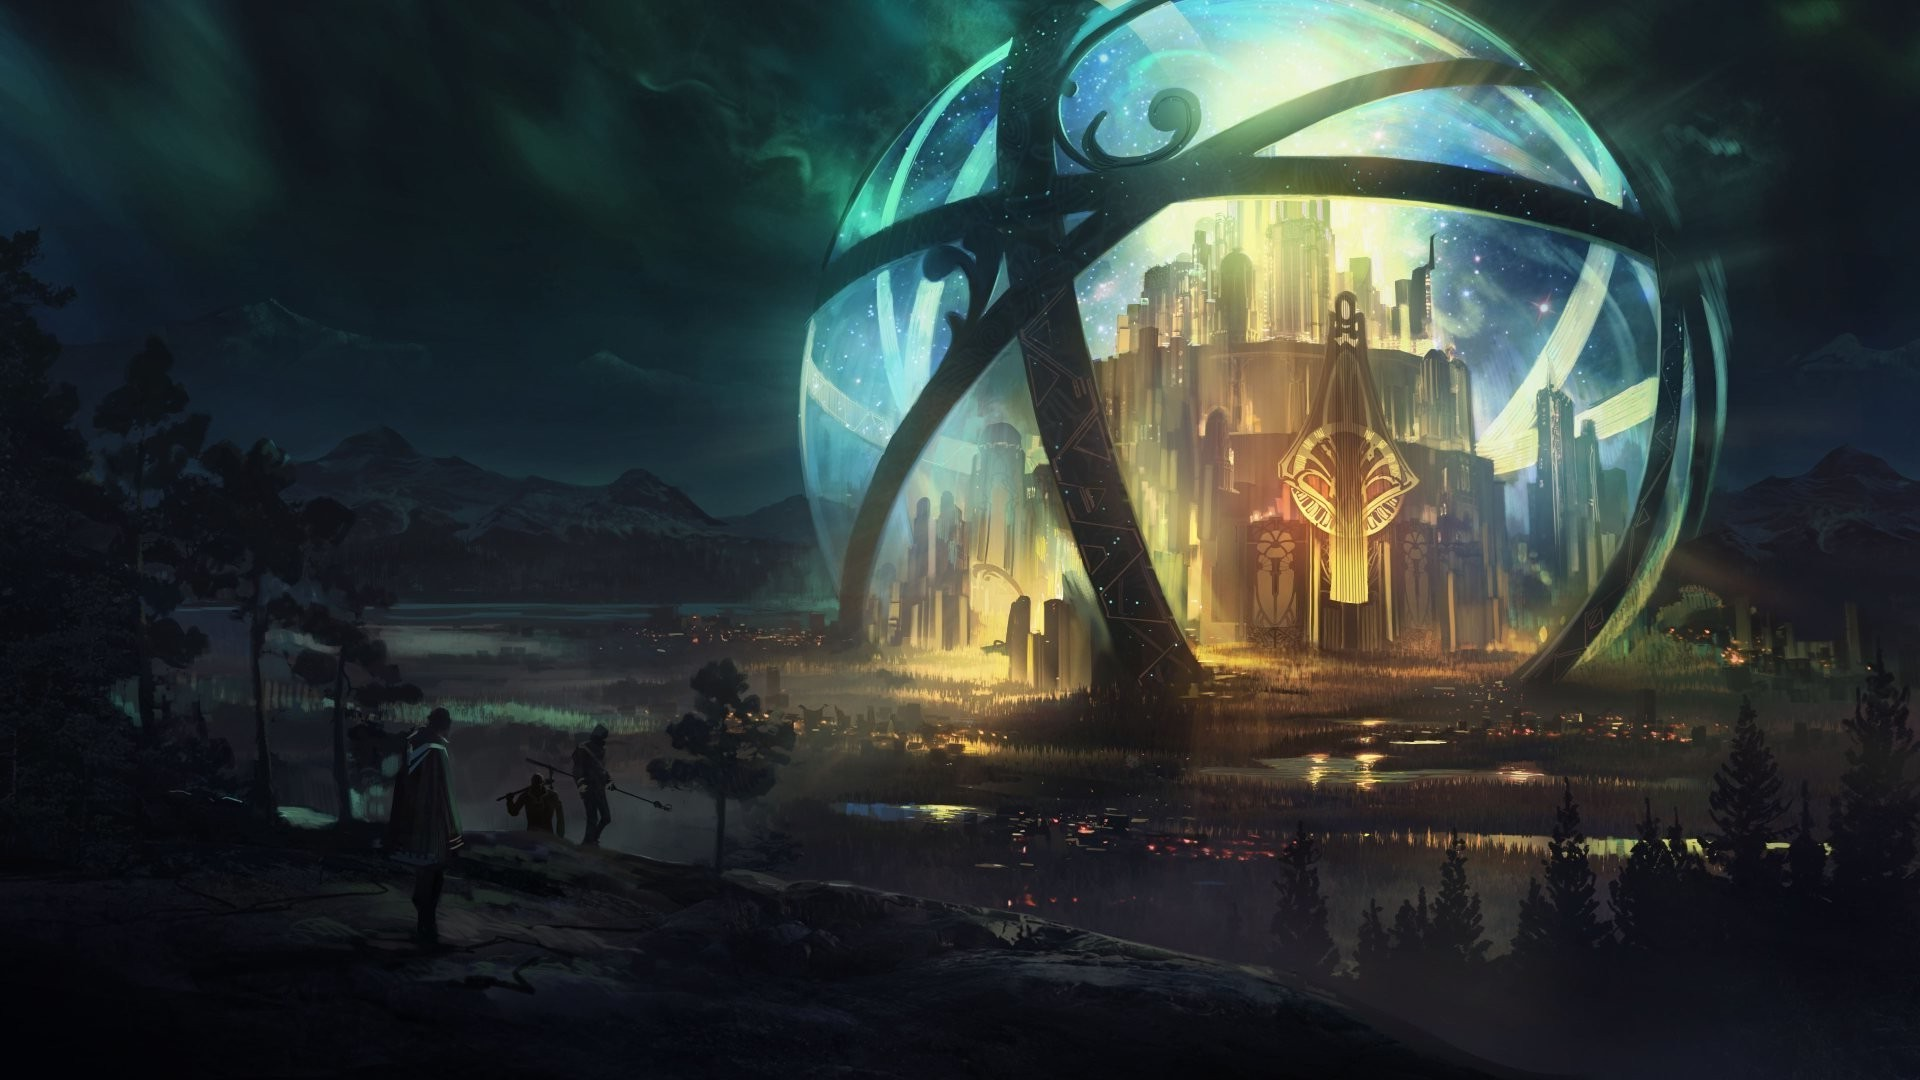 Artwork, Digital Art, City, Sphere, Fantasy Art Wallpapers - Fantasy Digital Art City , HD Wallpaper & Backgrounds